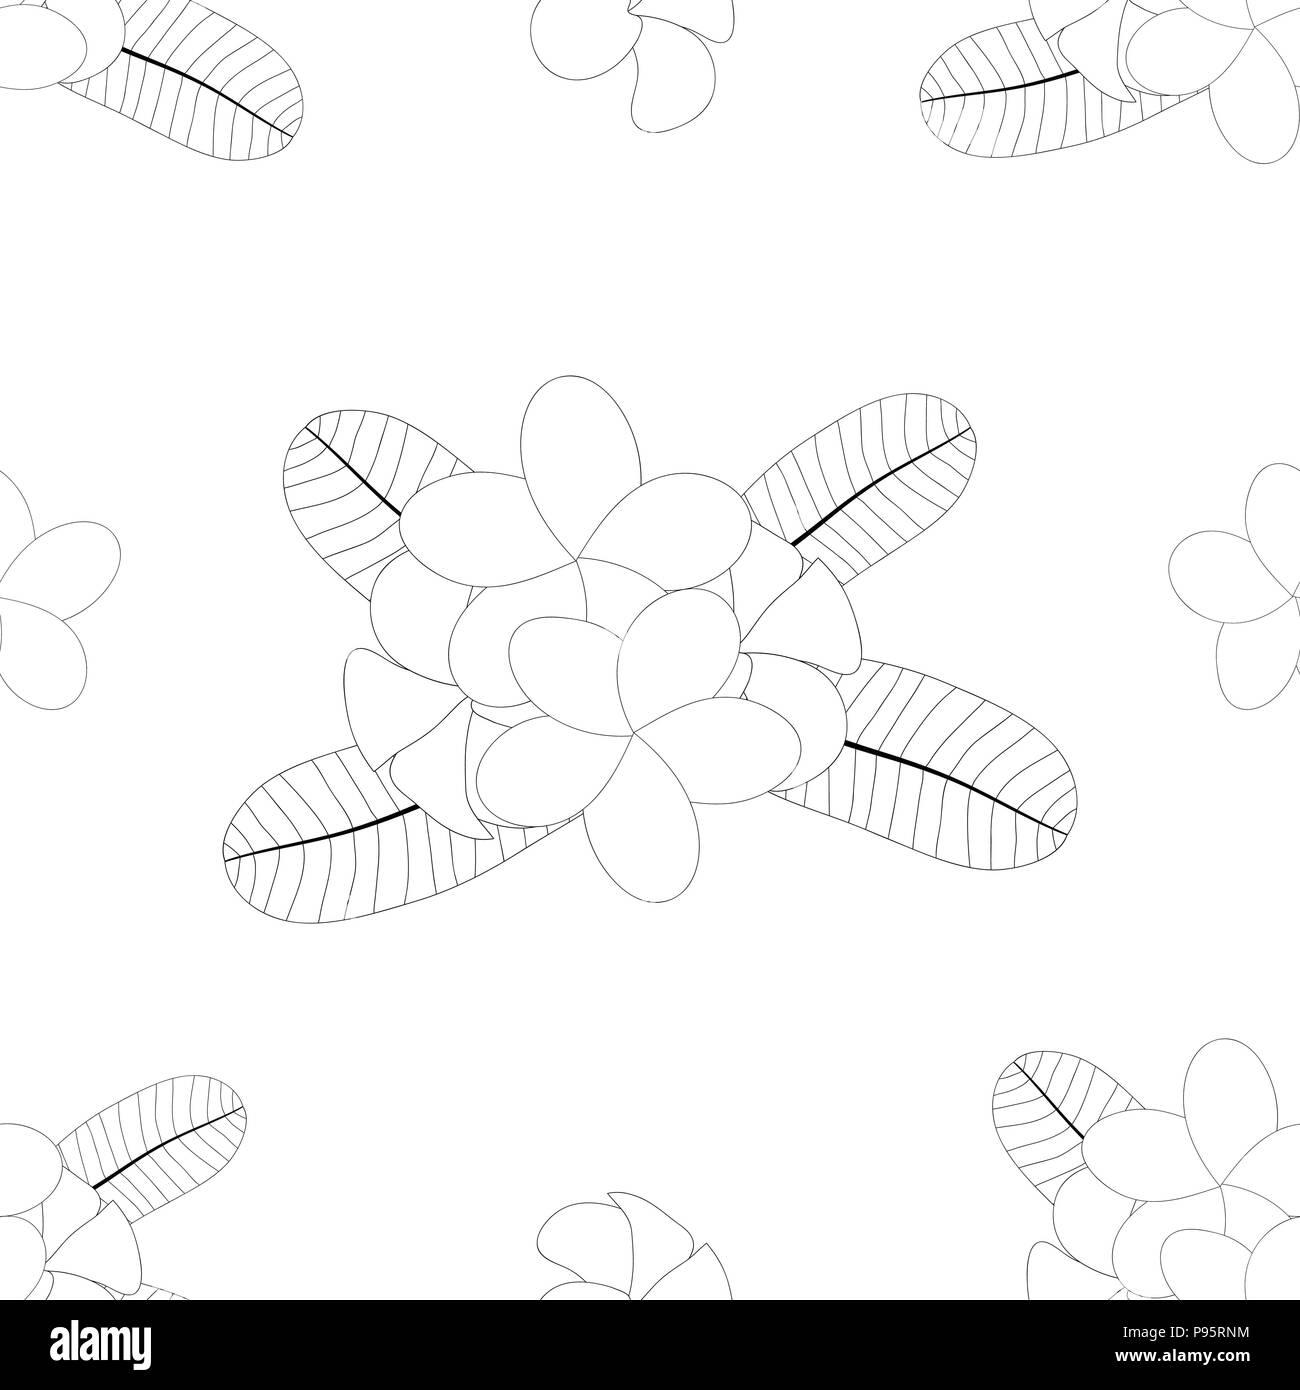 Plumeria, Frangipani on White Background. Vector Illustration. - Stock Vector